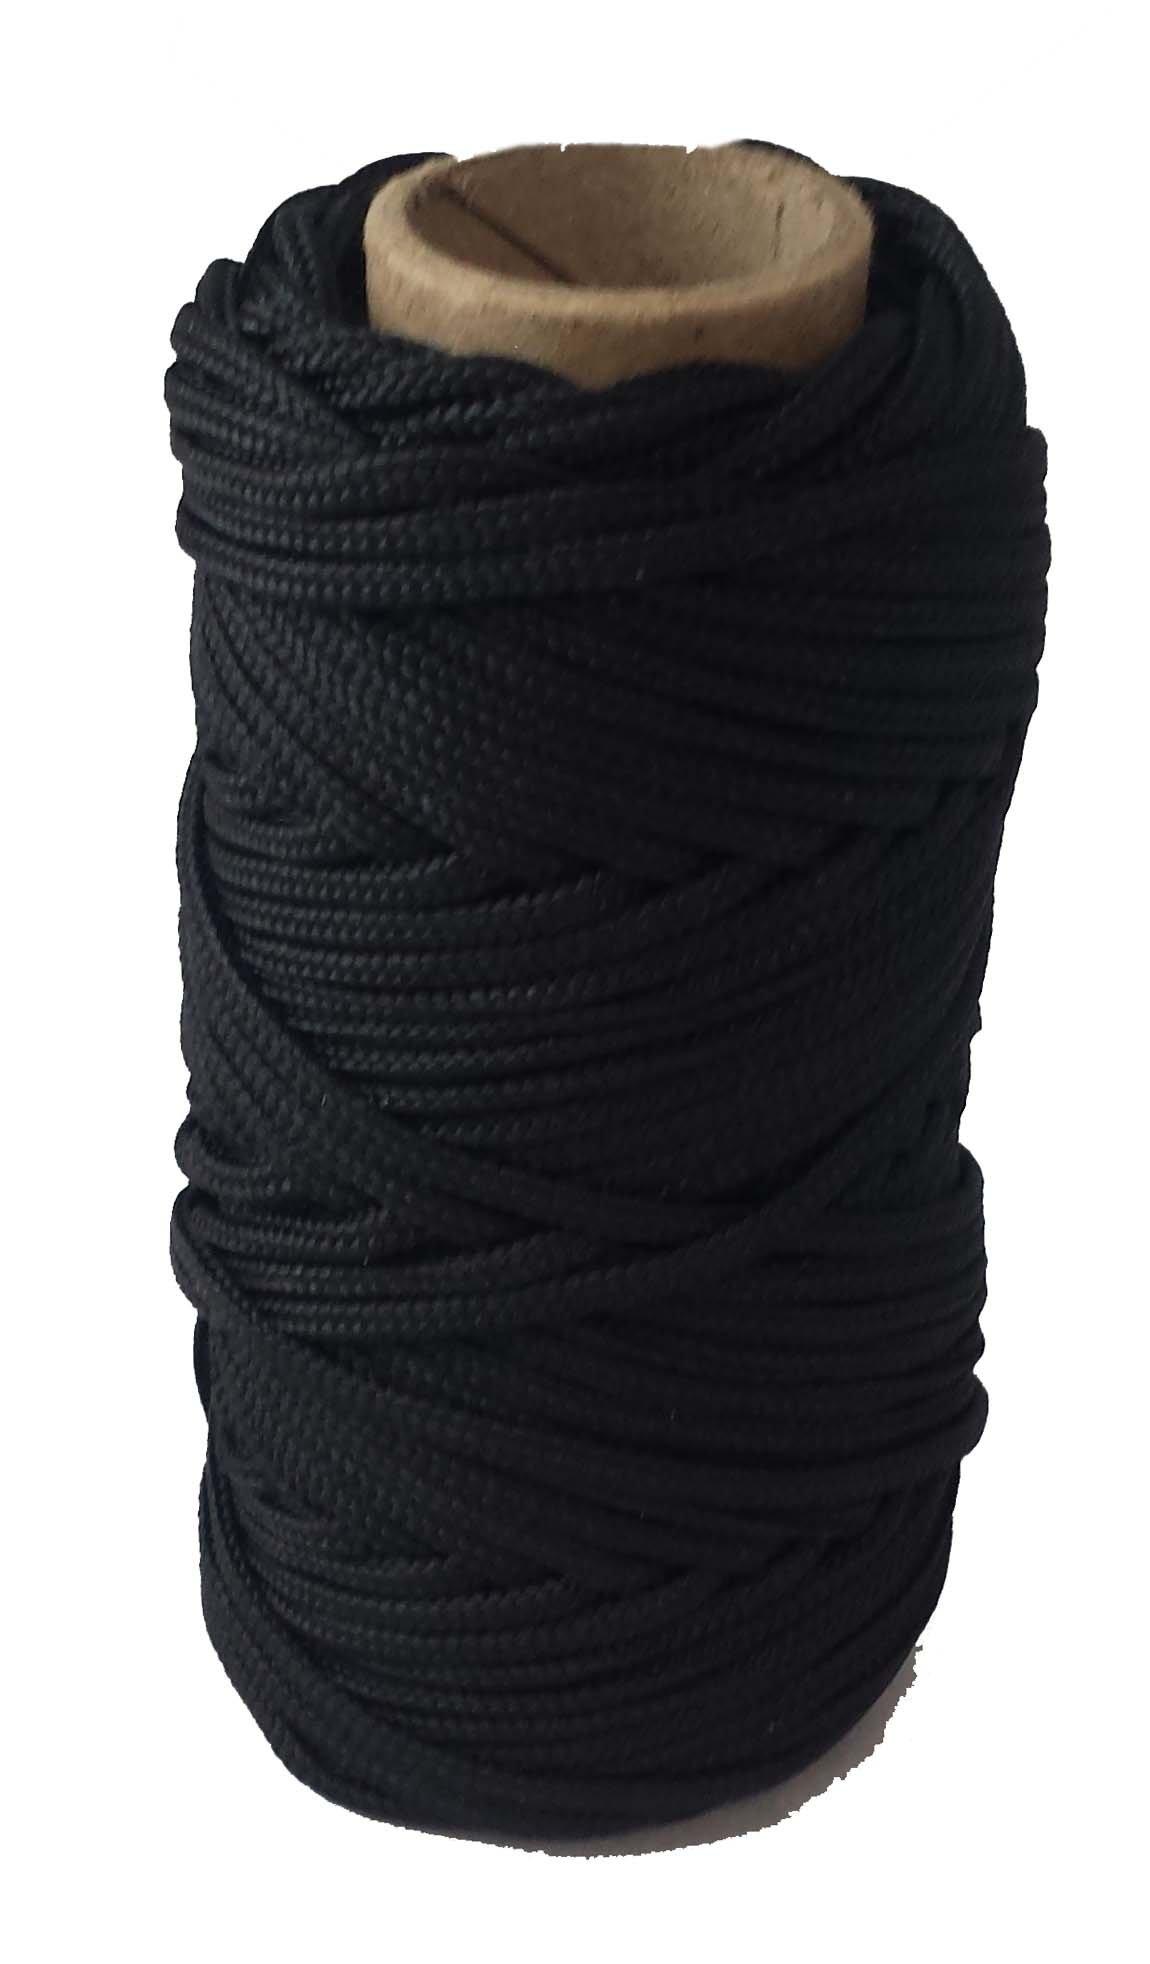 T.W Evans Cordage Co. 12-636-200#36 200' Black and Tarred Braided Nylon Decoy Line